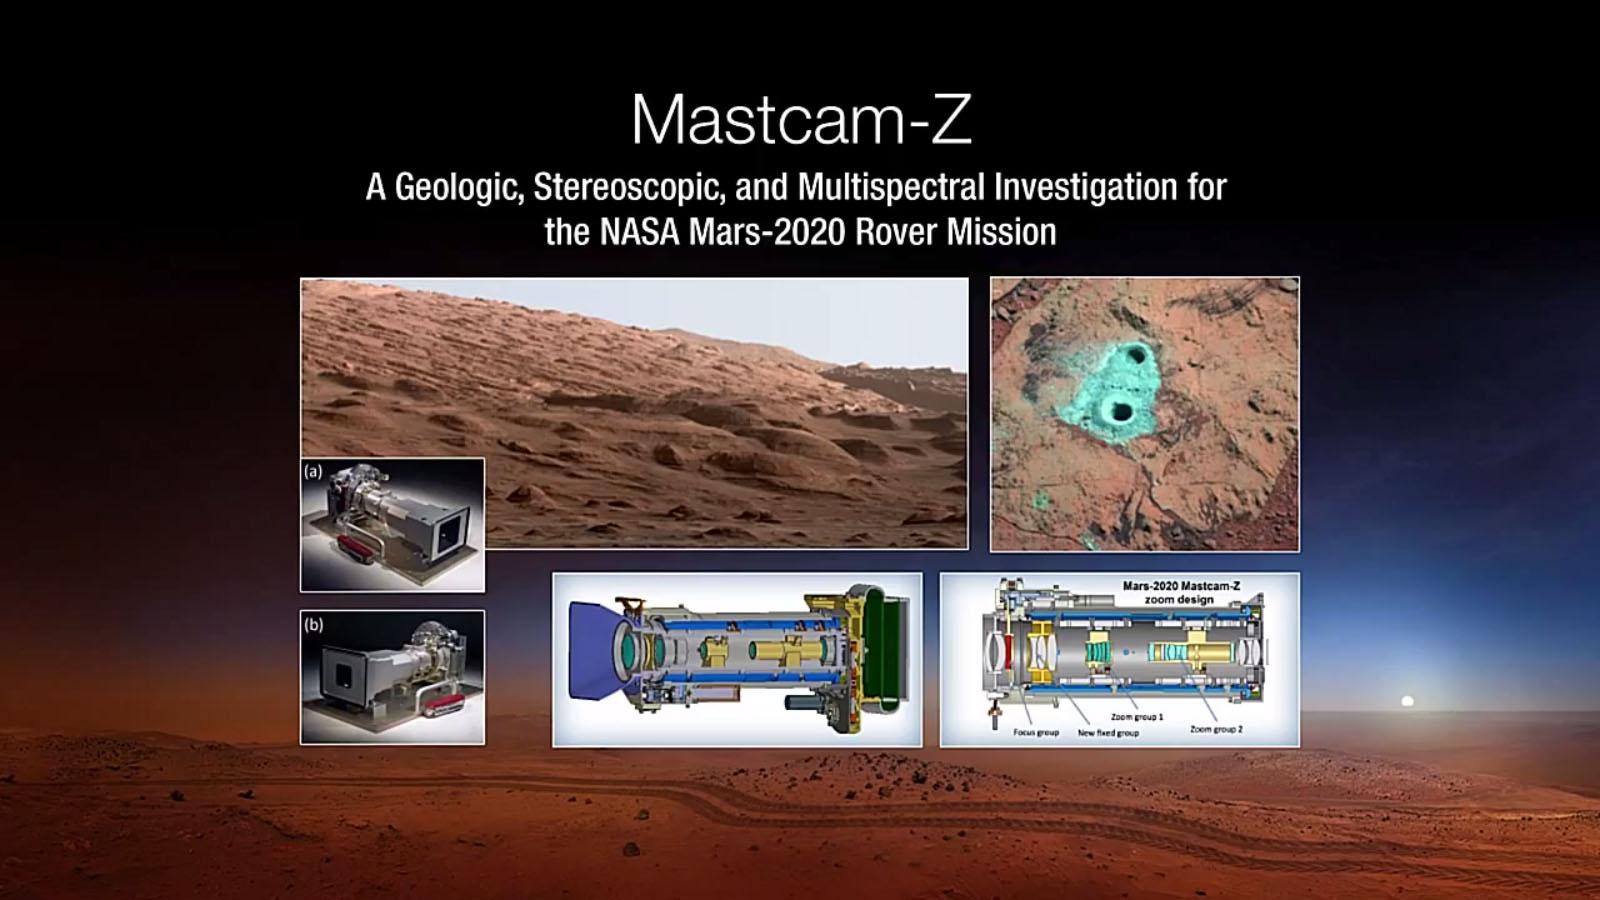 Mars Rover 2020: Mastcam-Z